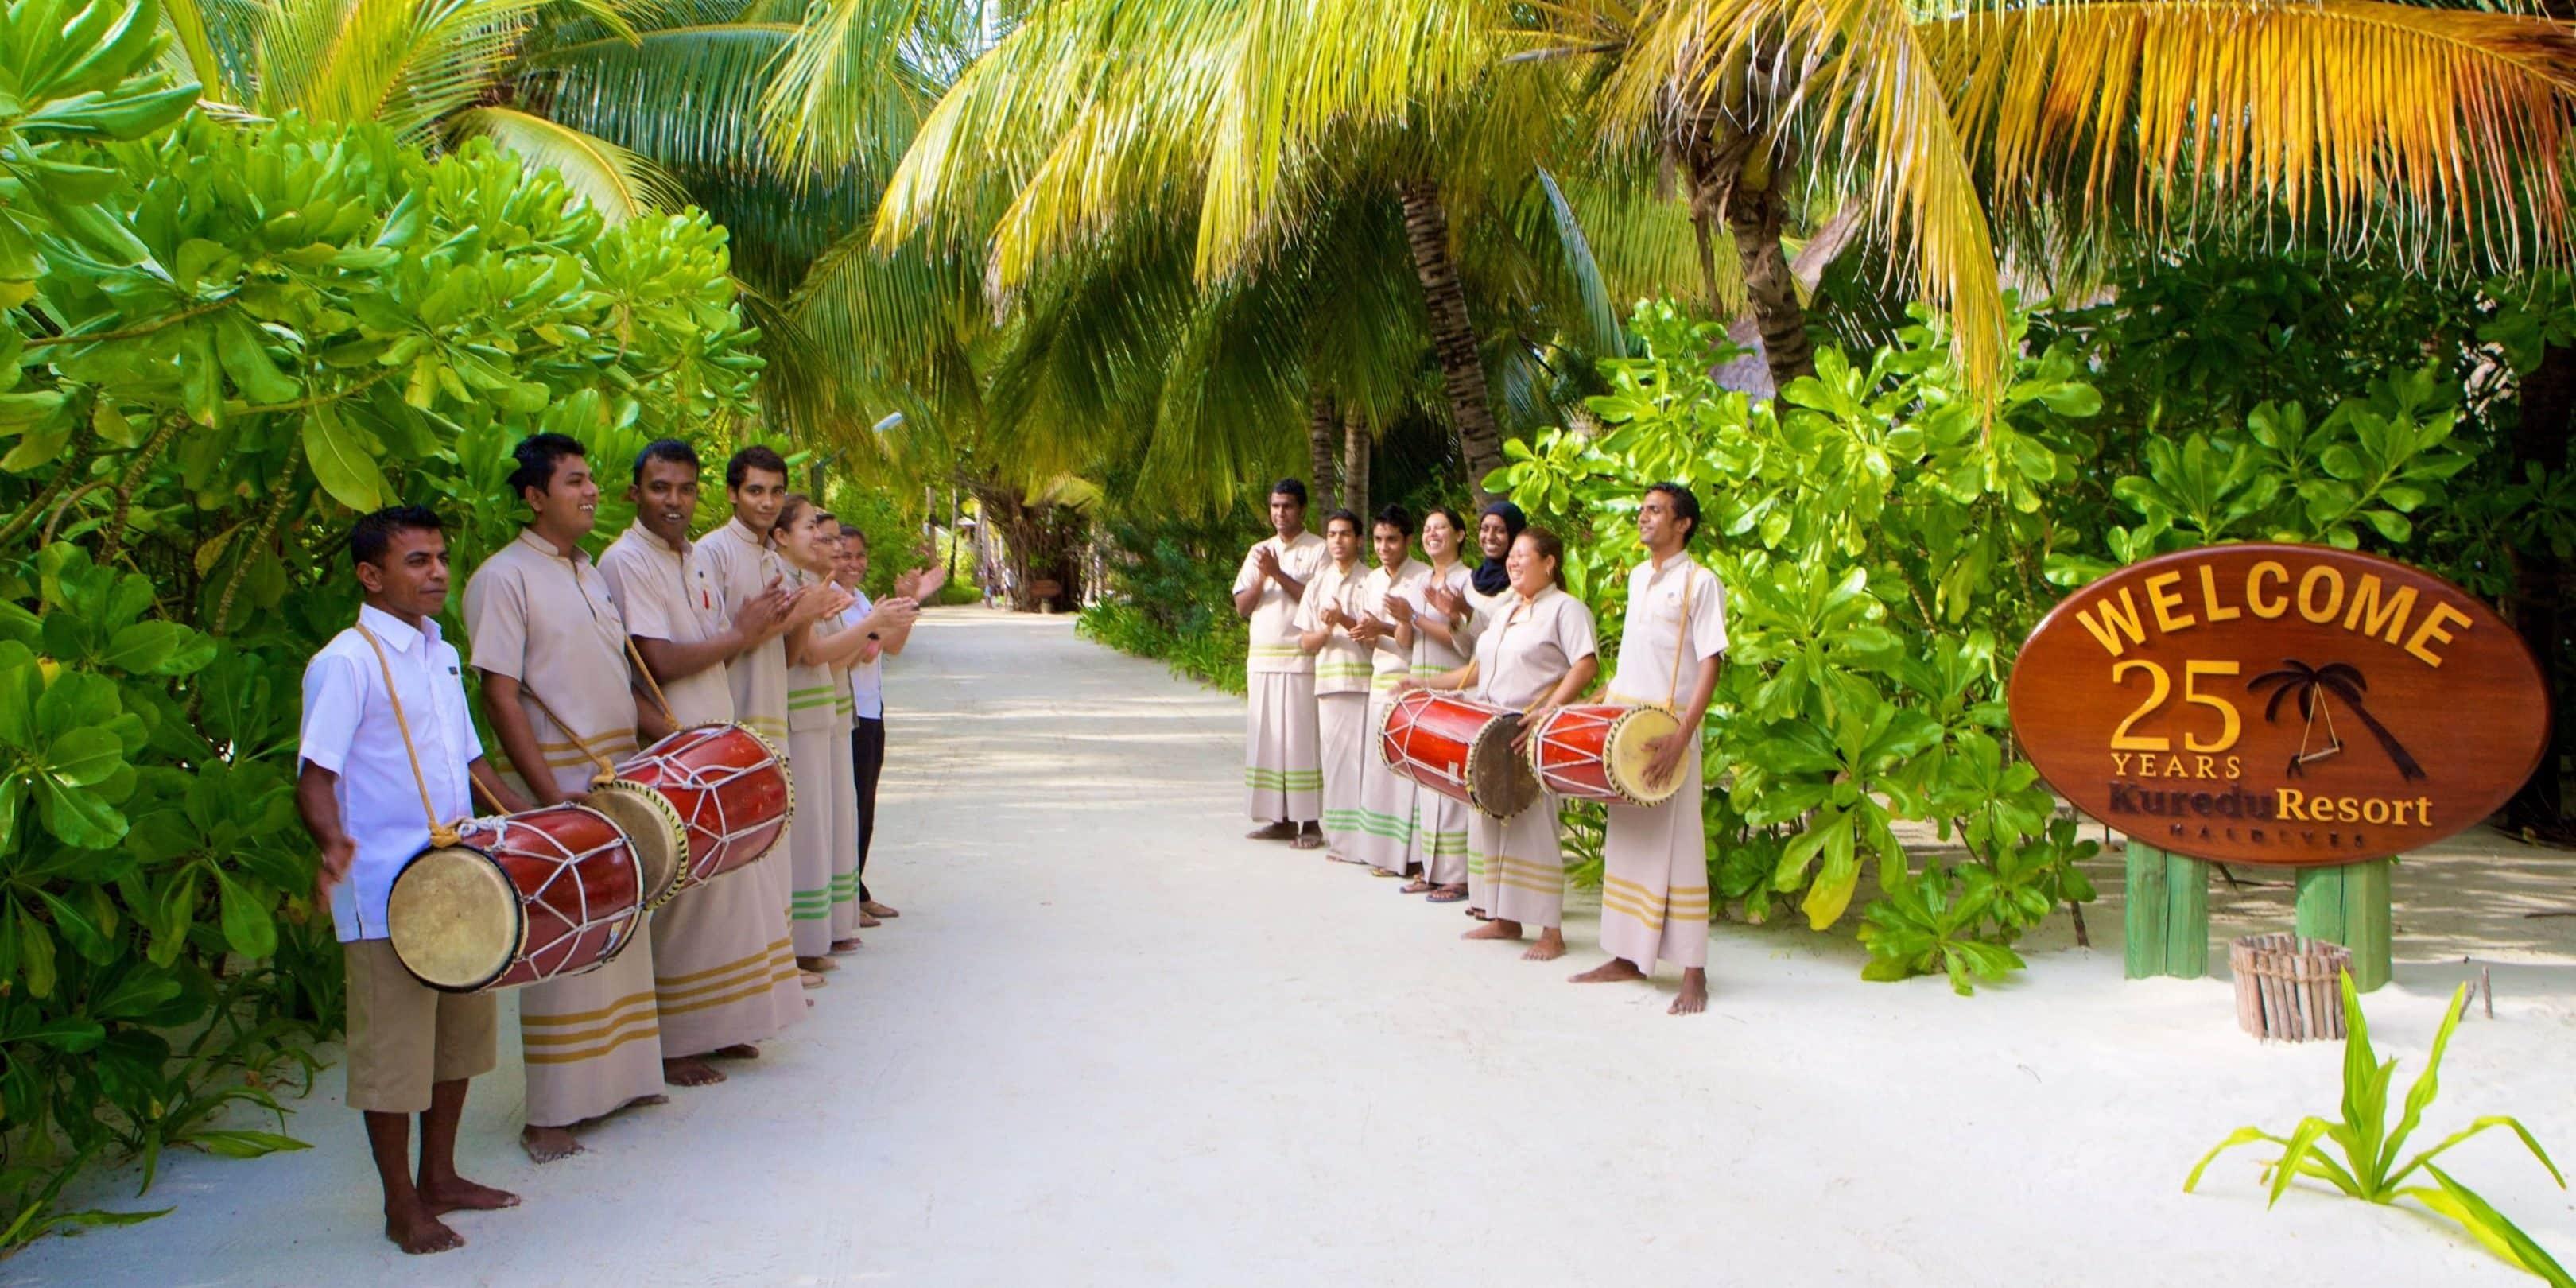 7 Days Kuredu Resort All-Inclusive Plus Package